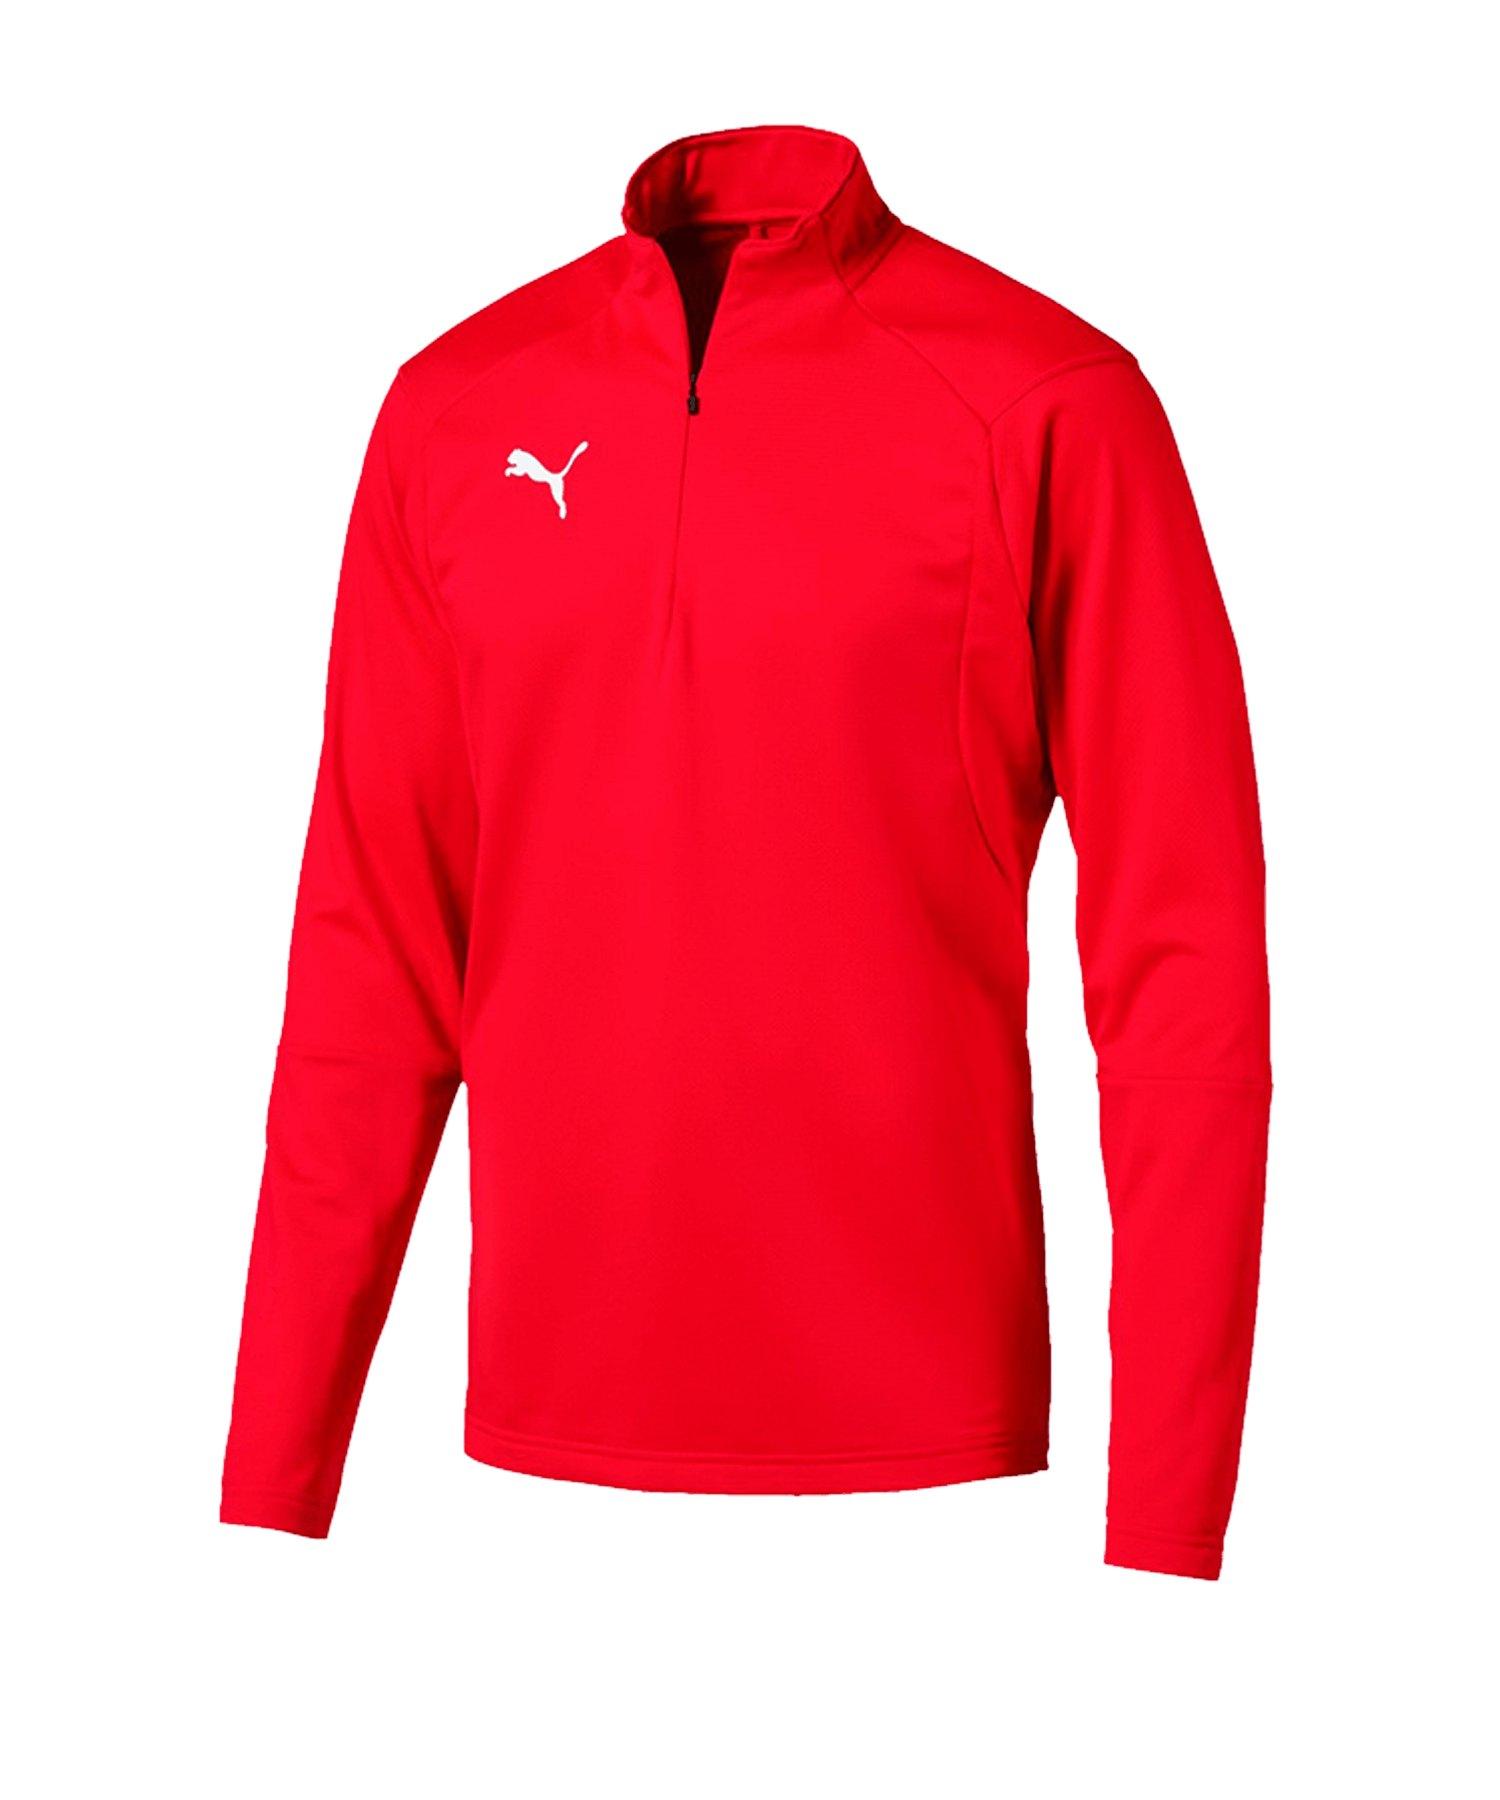 PUMA LIGA Training 1/4 Zip Top Sweatshirt Rot F01 - rot